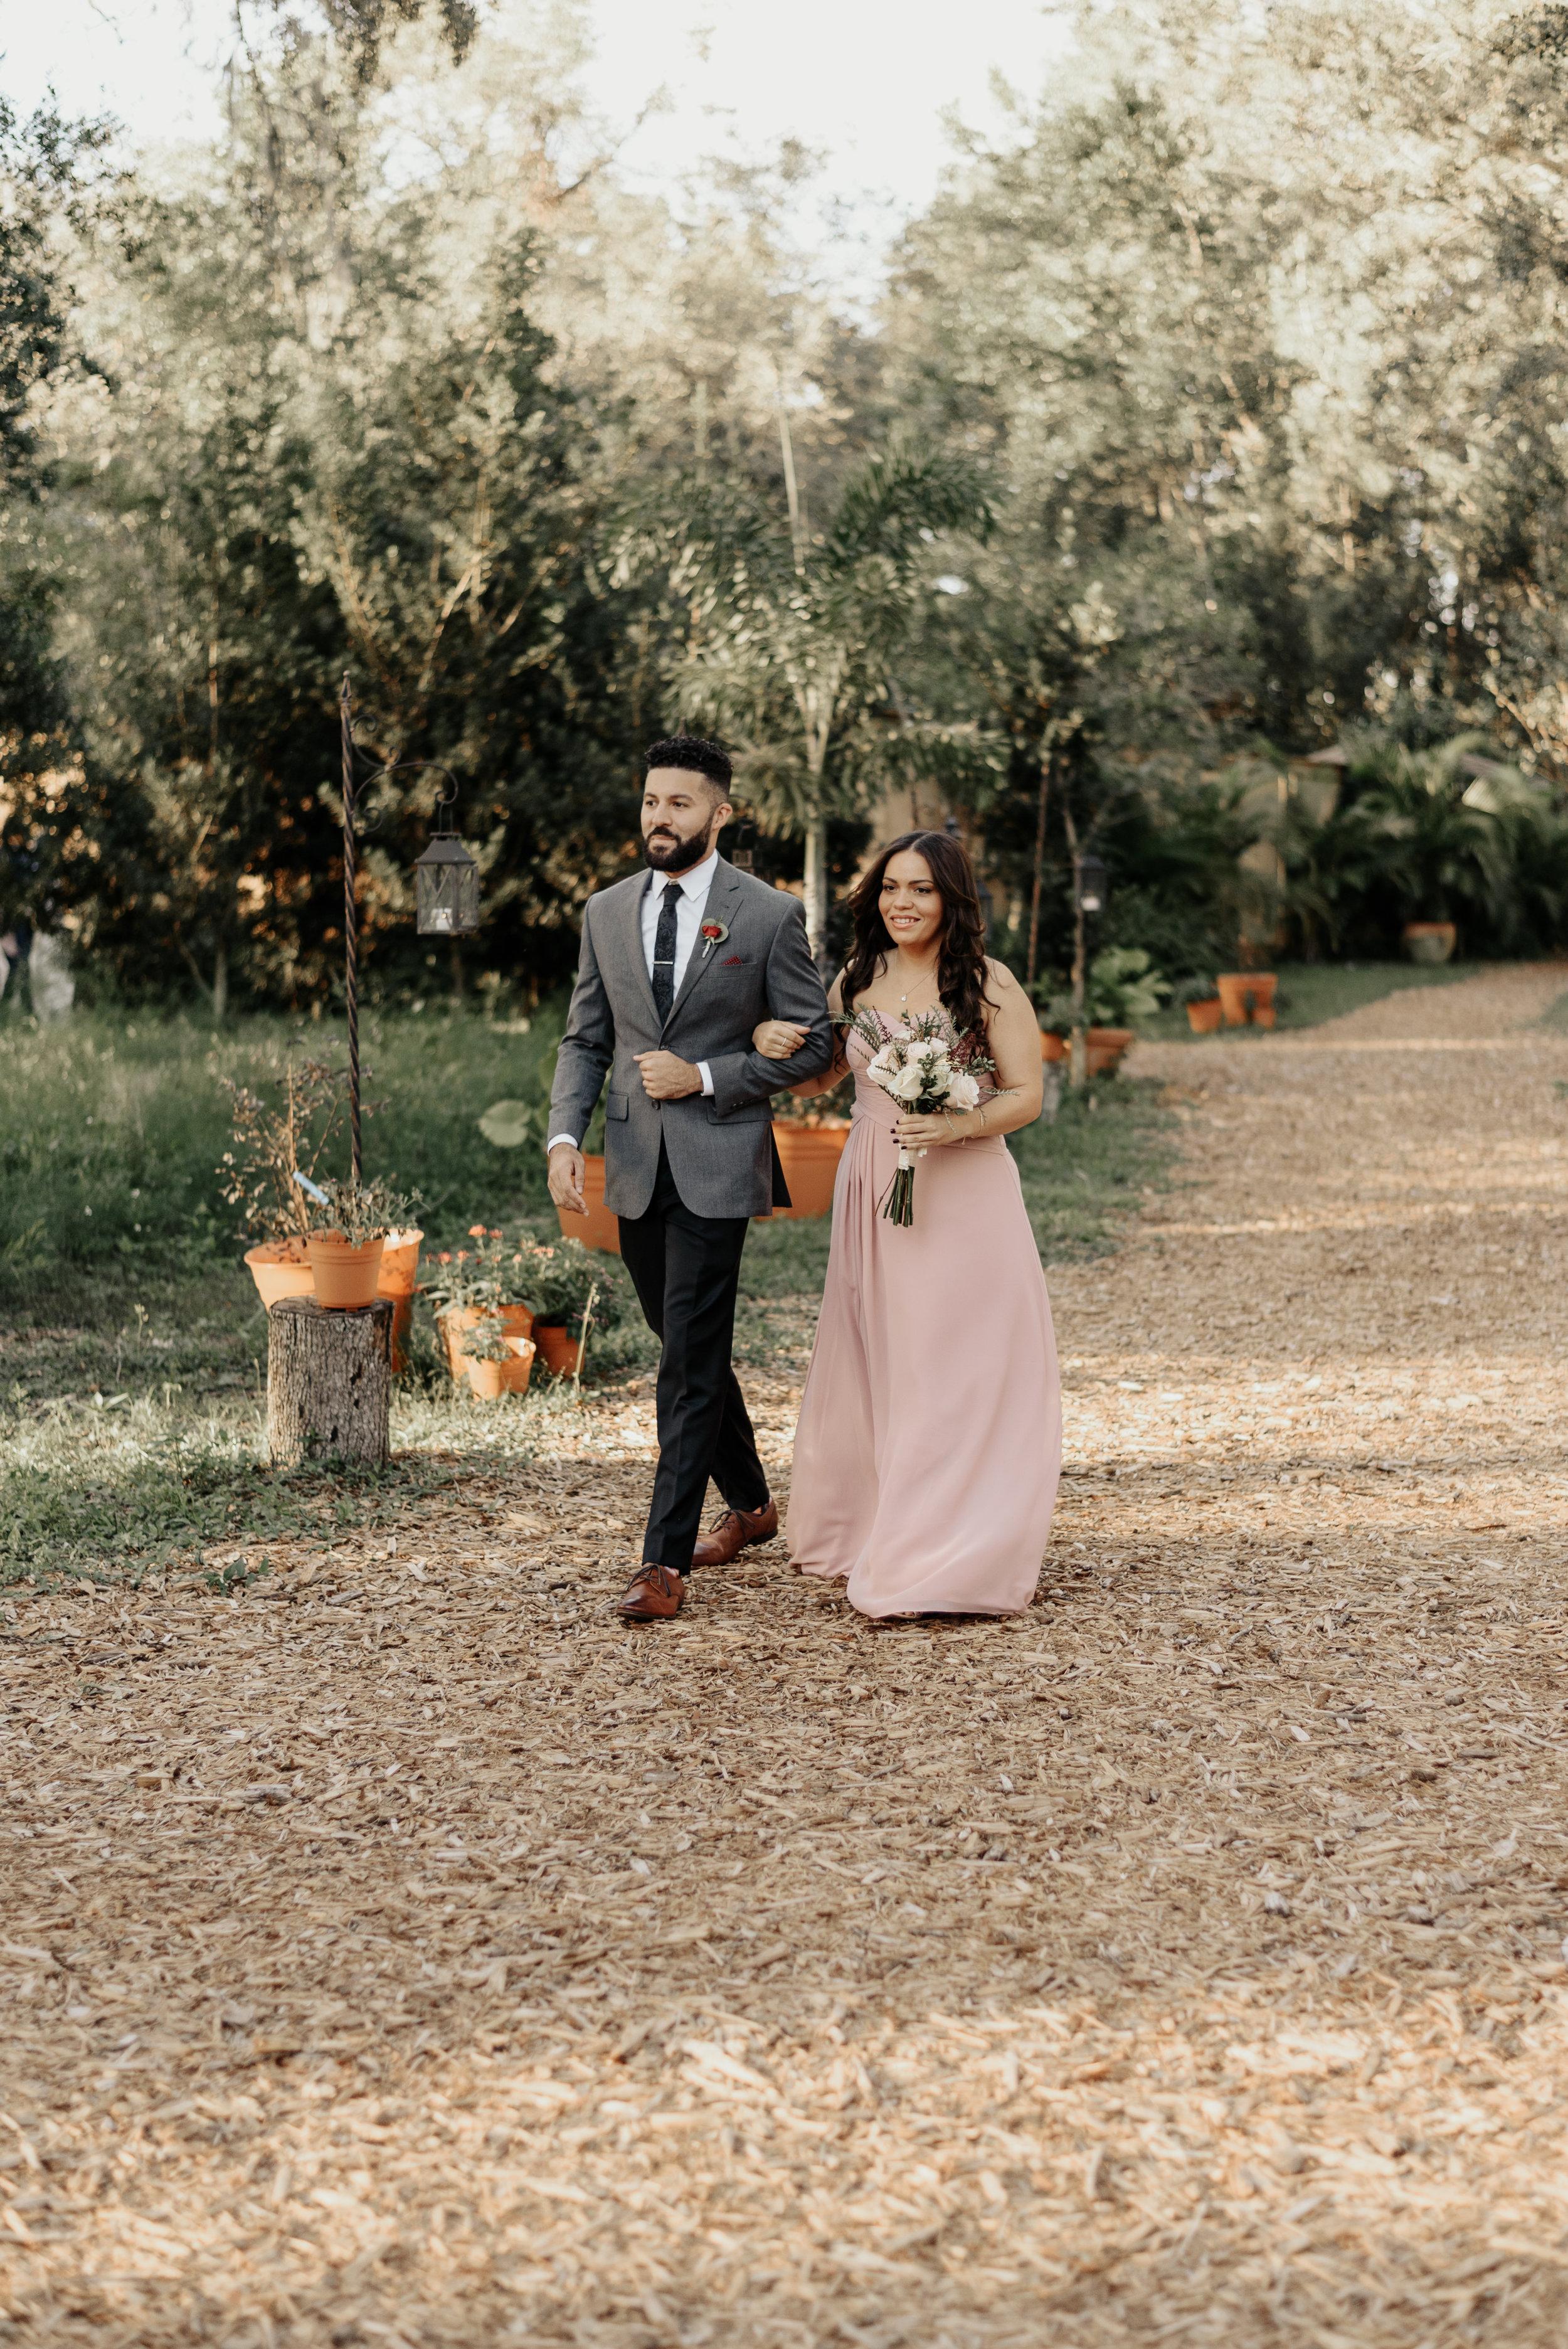 Kirstie-AJ-Wedding-8725.jpg